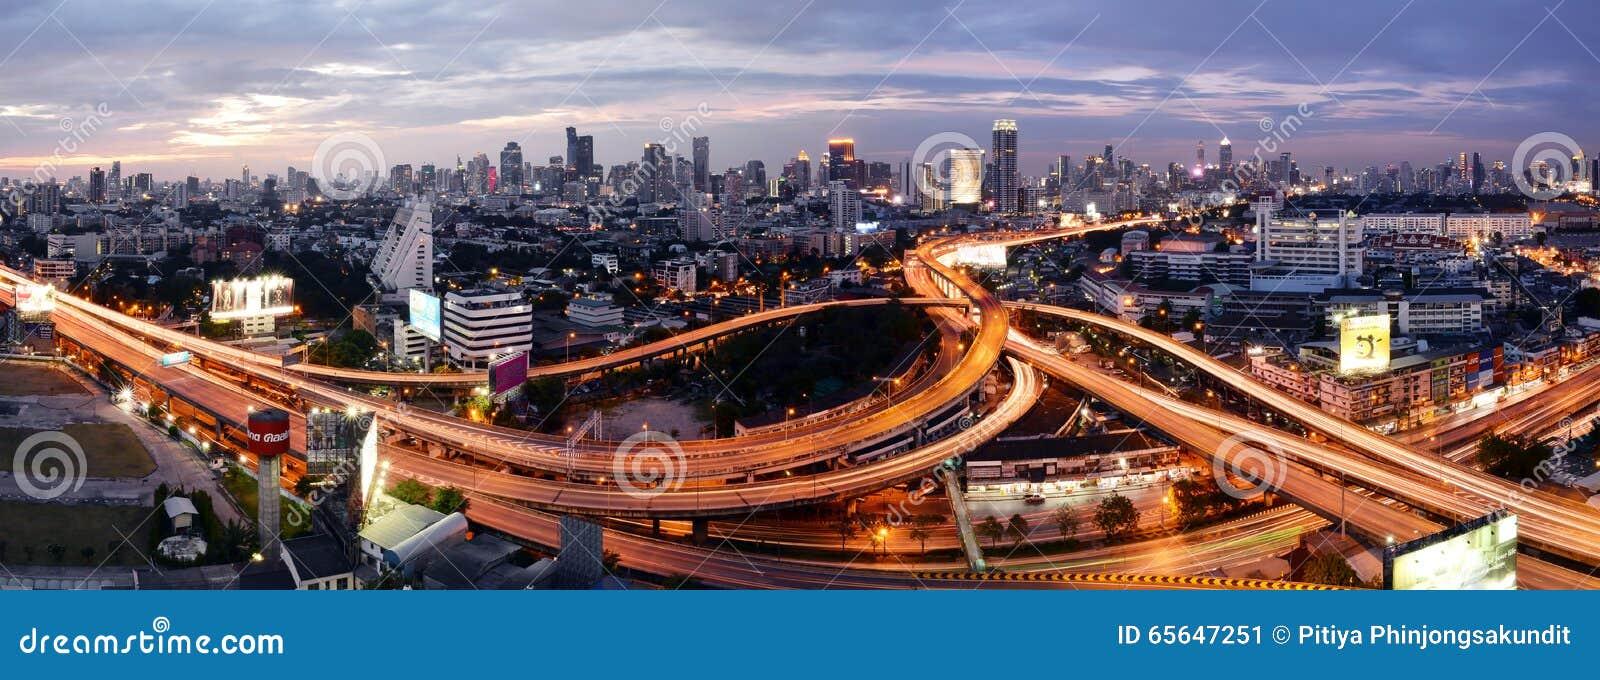 Bangkok, Thaïlande - 16 janvier 2016 : Horizon de Bangkok avec la ville